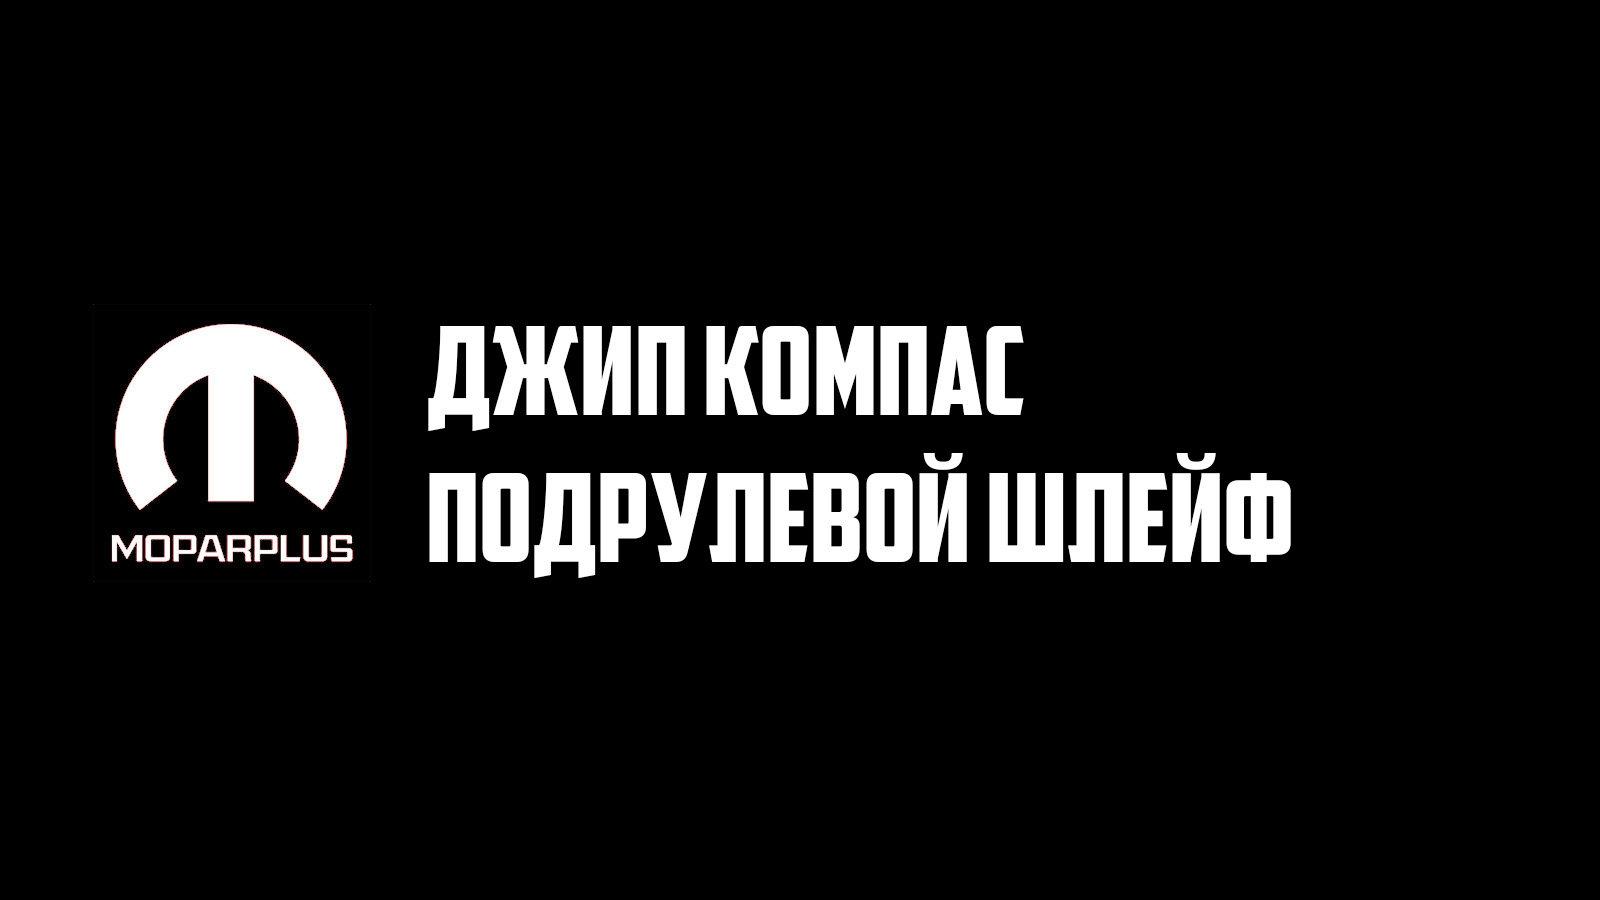 Клокспринг Джип Компас – калибровка